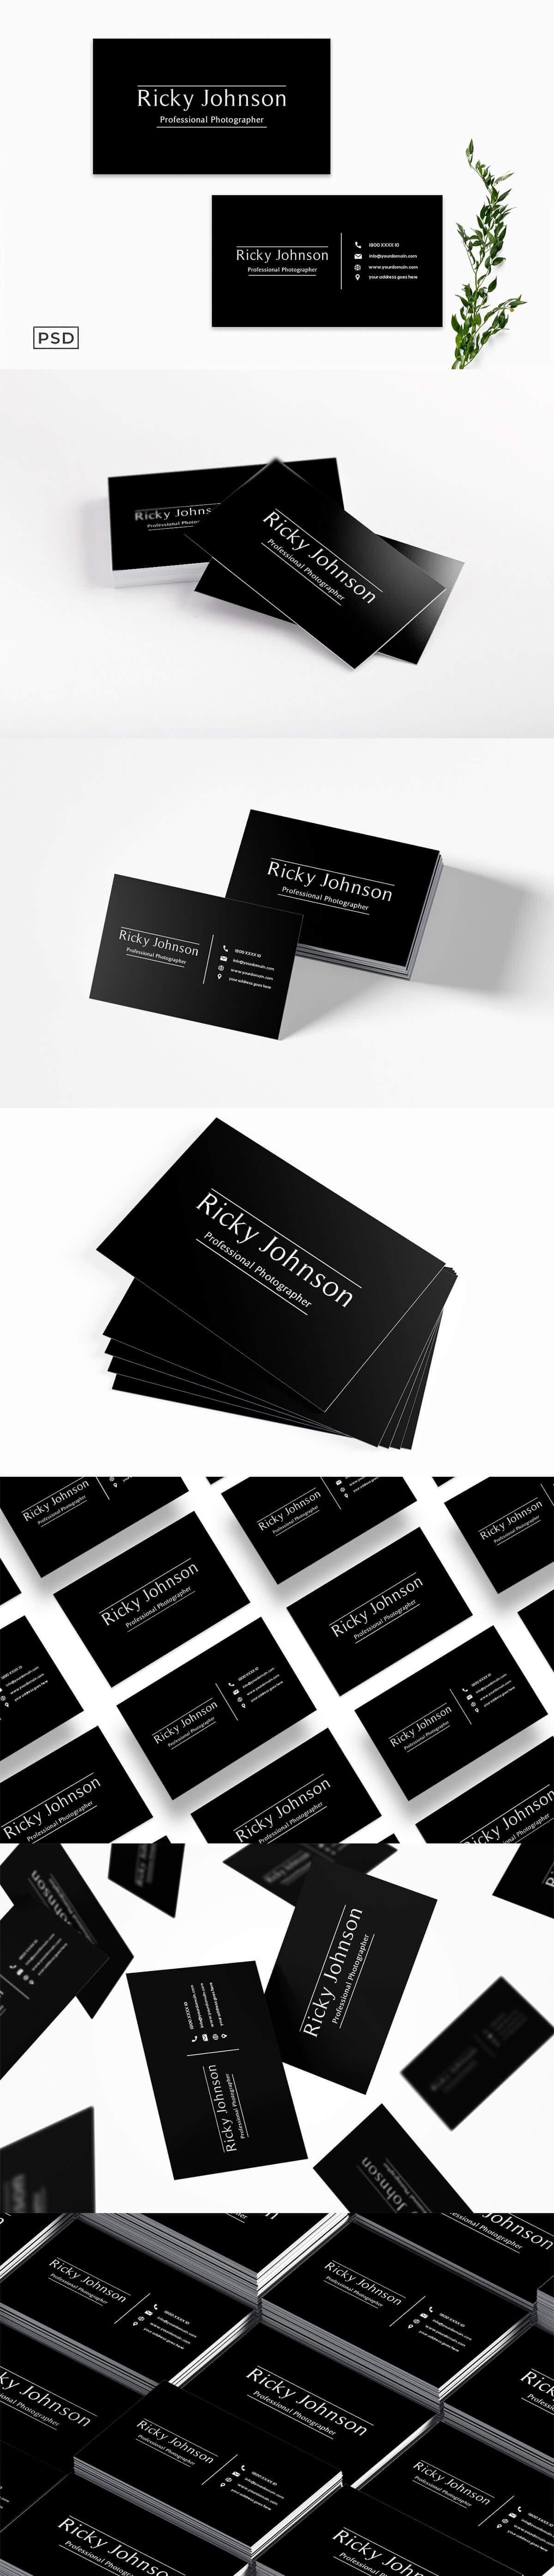 Free Black Minimal Business Card Template